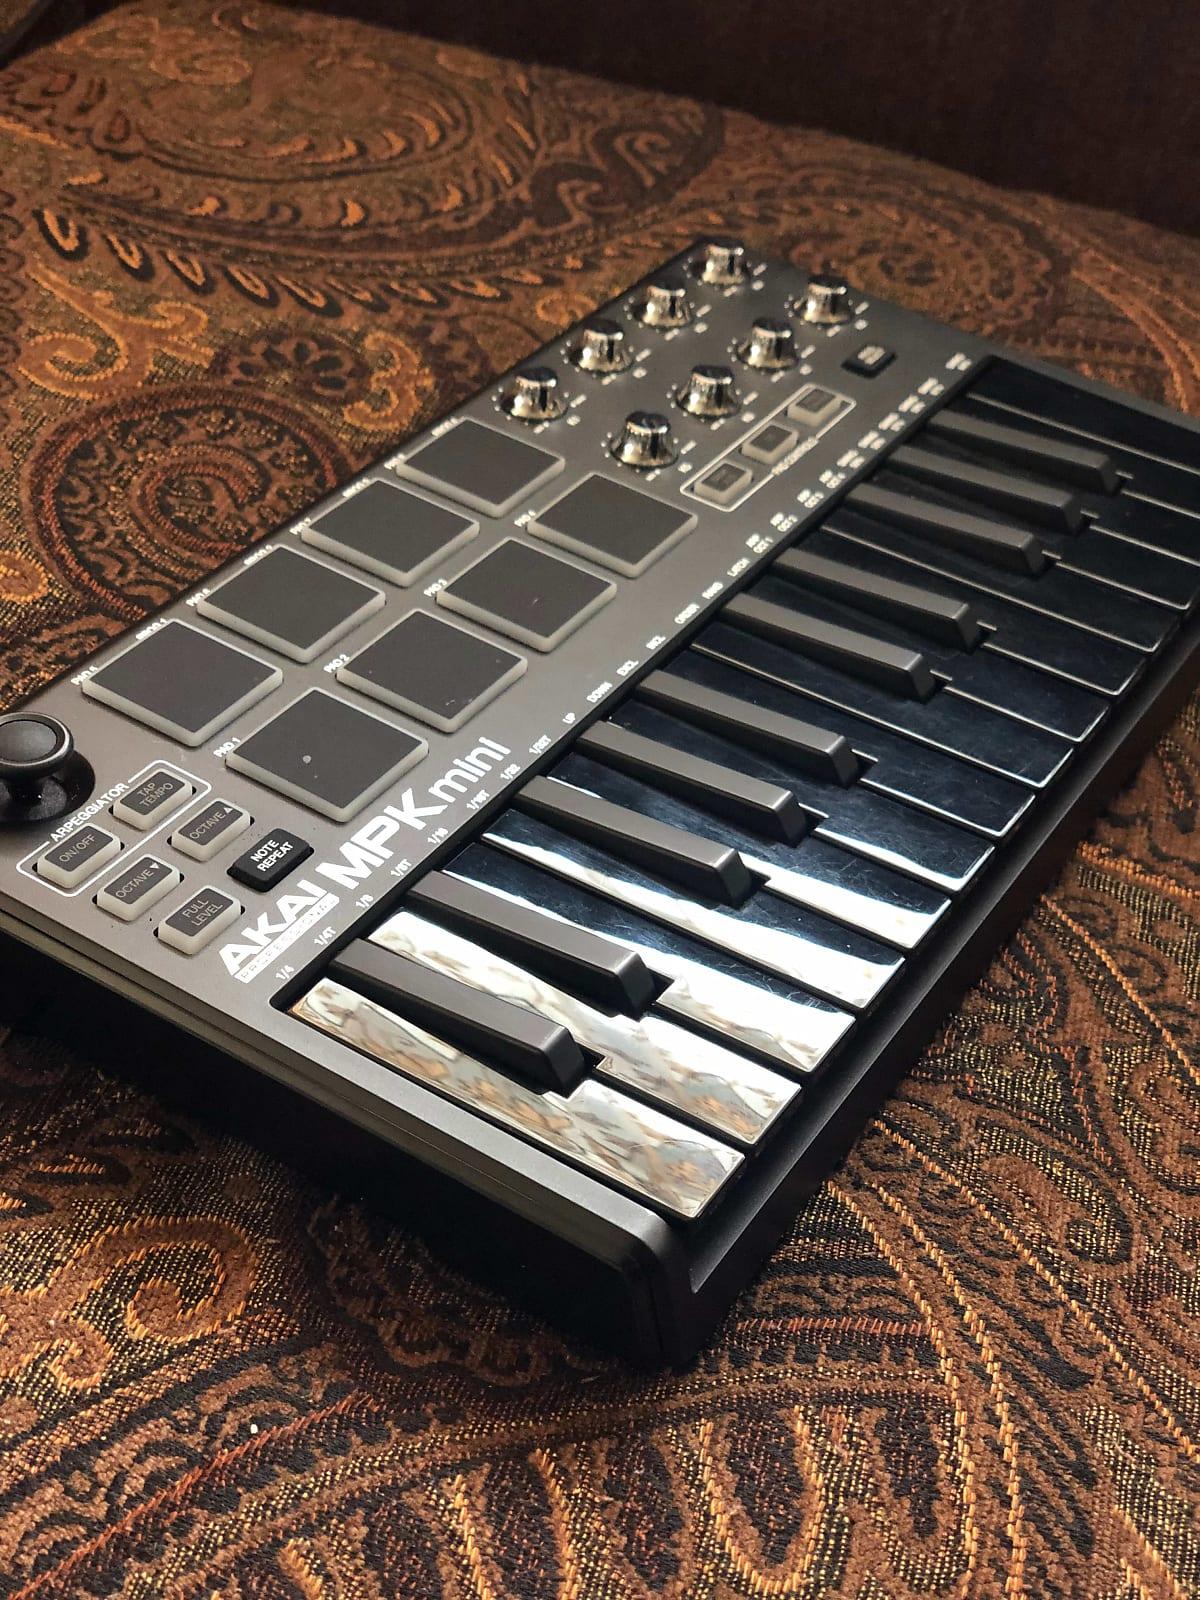 MATRIXSYNTH: Akai MPK Mini MIDI Controller Limited Black Out Edition